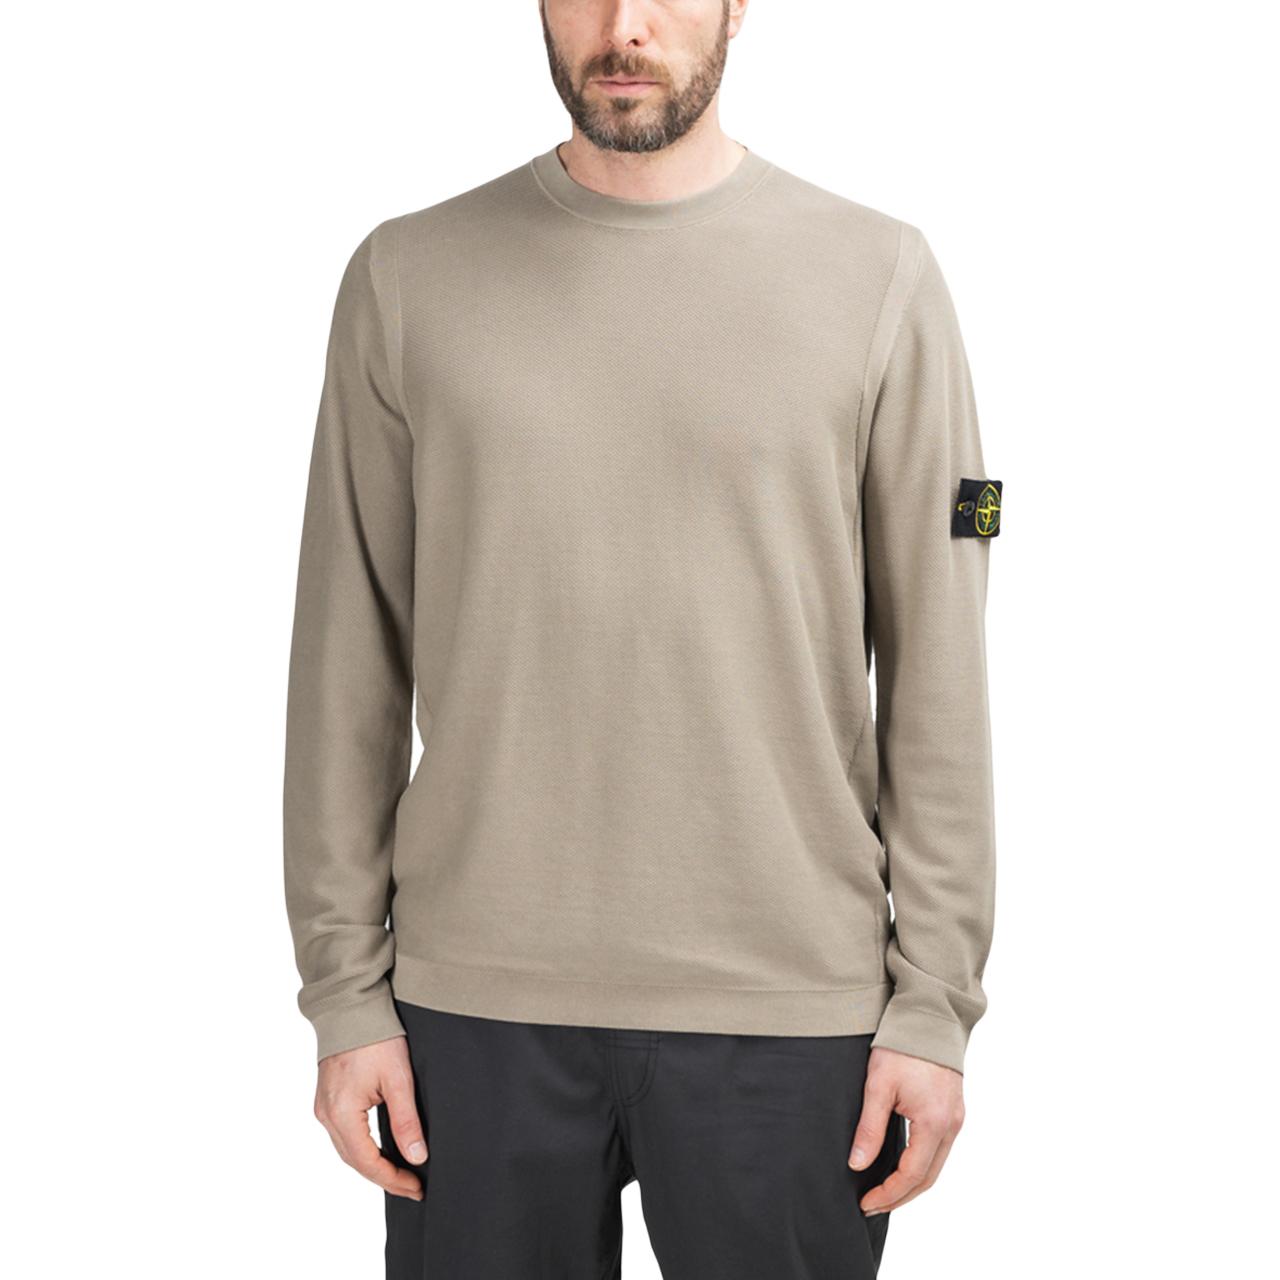 Stone Island Pigment DYE Knit Pullover (Dunkelbeige)